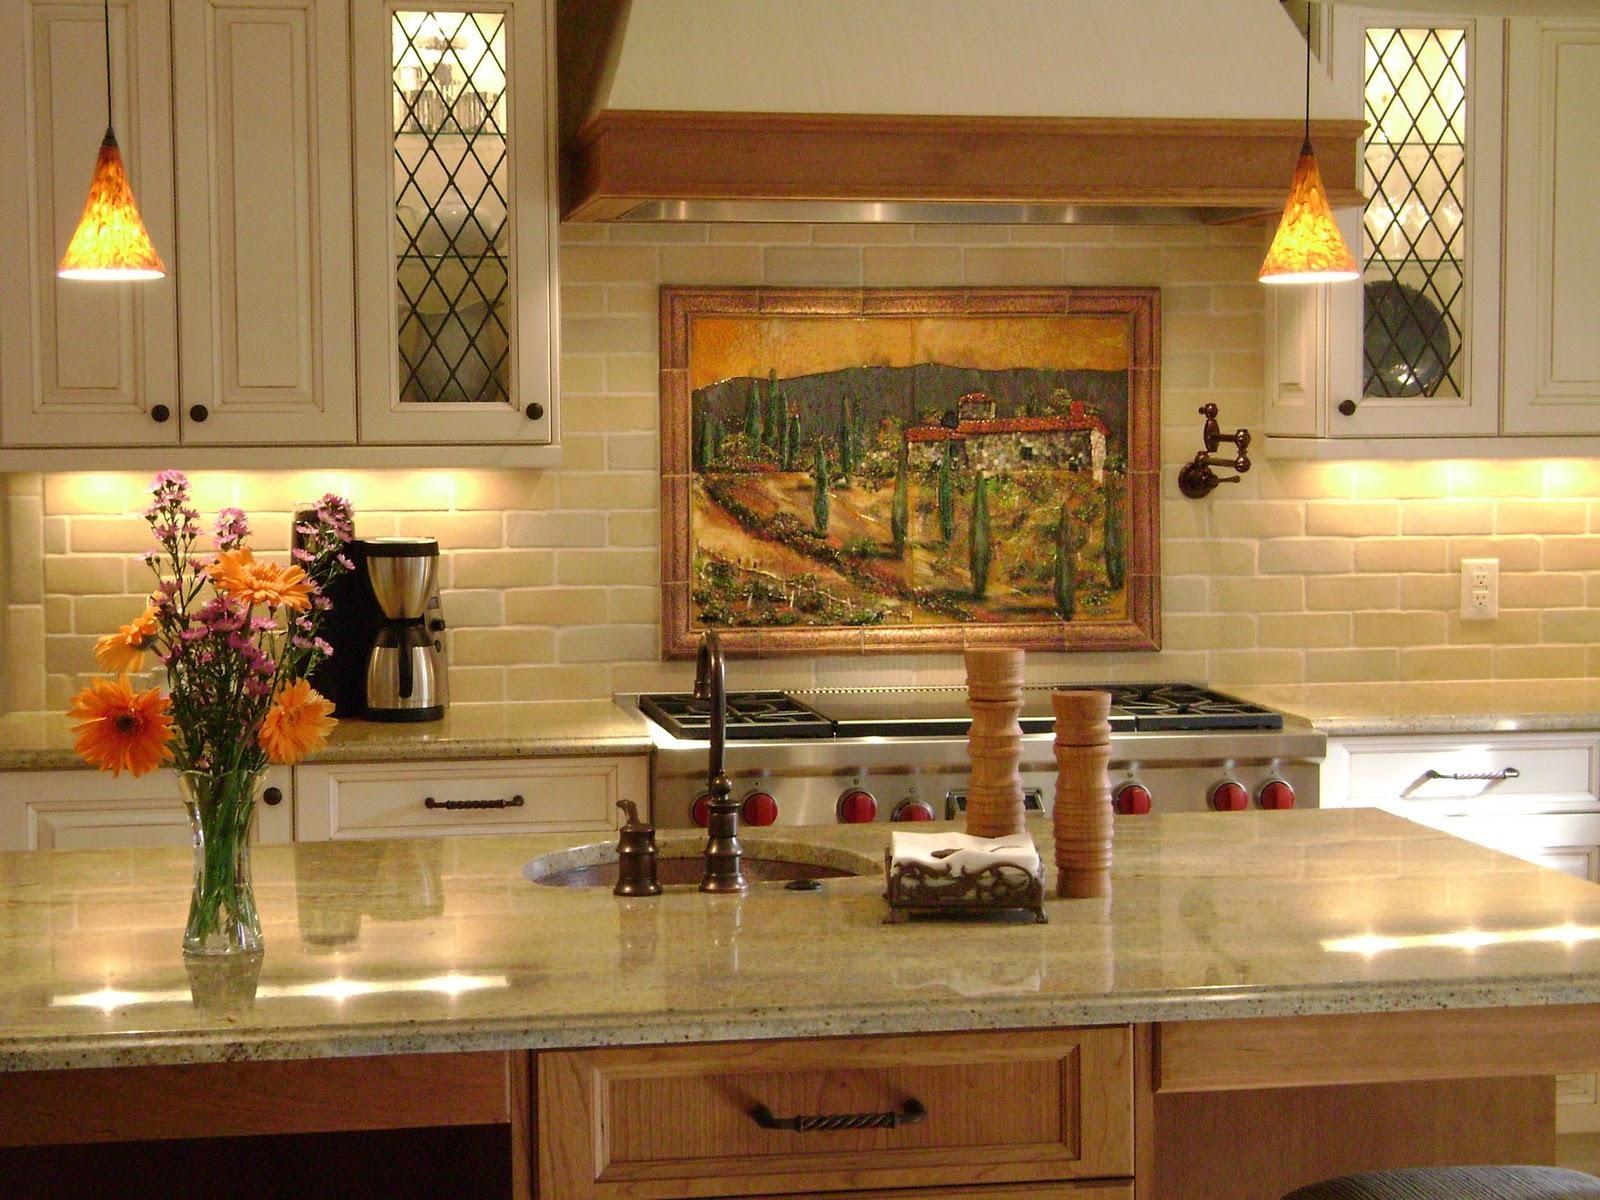 Italian Art Tuscan Kitchen Wall Decor Ideas Inexpensive Tuscan With Regard To Italian Style Wall Art (View 17 of 20)